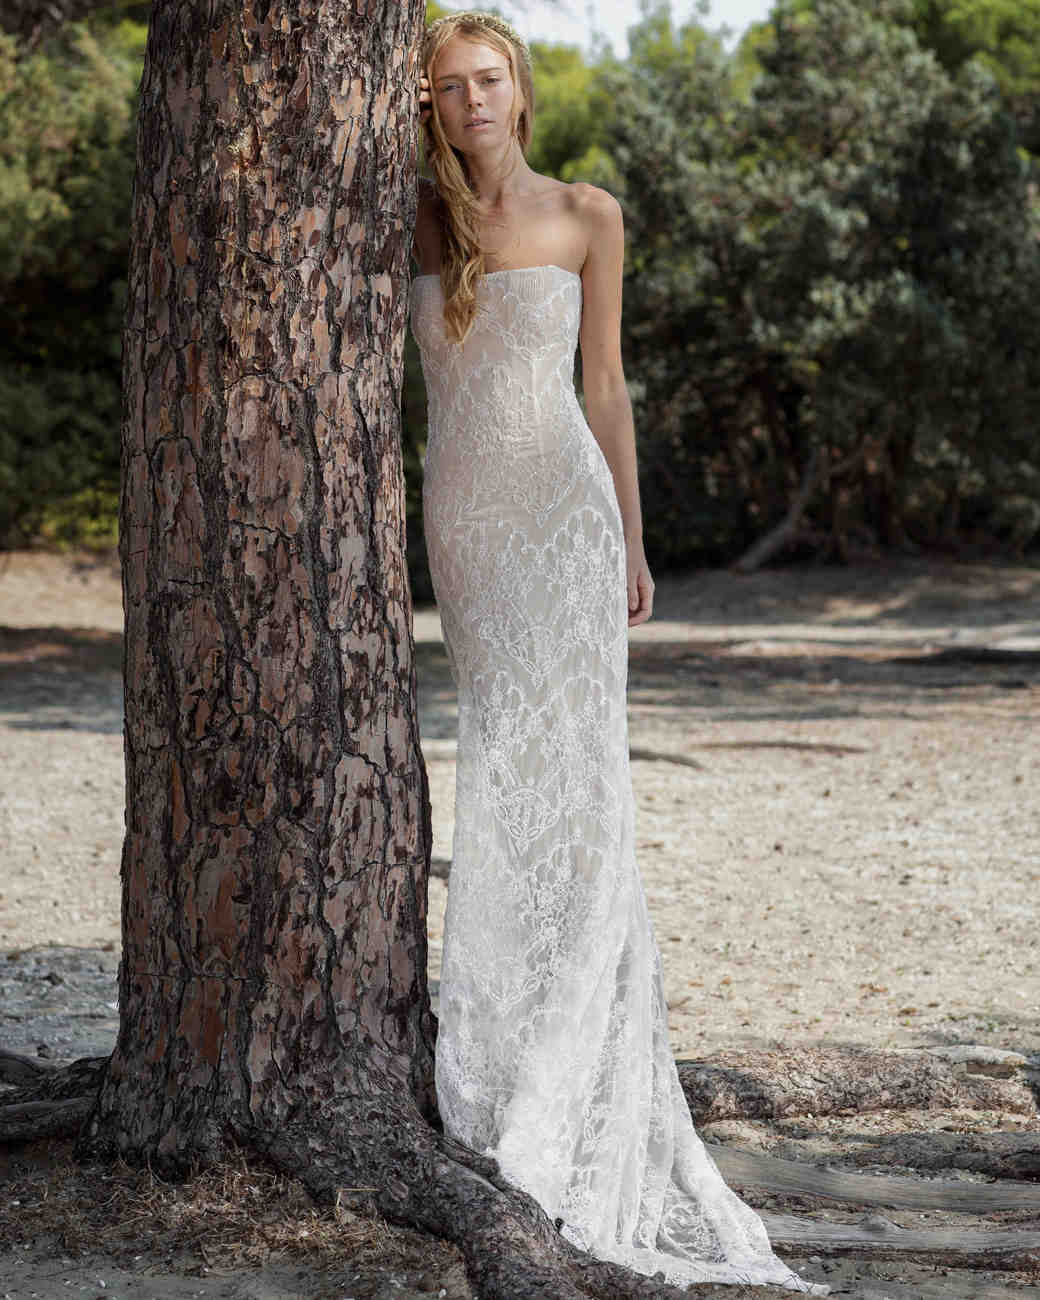 costarellos-fall2016-wedding-dress-16-38.jpg